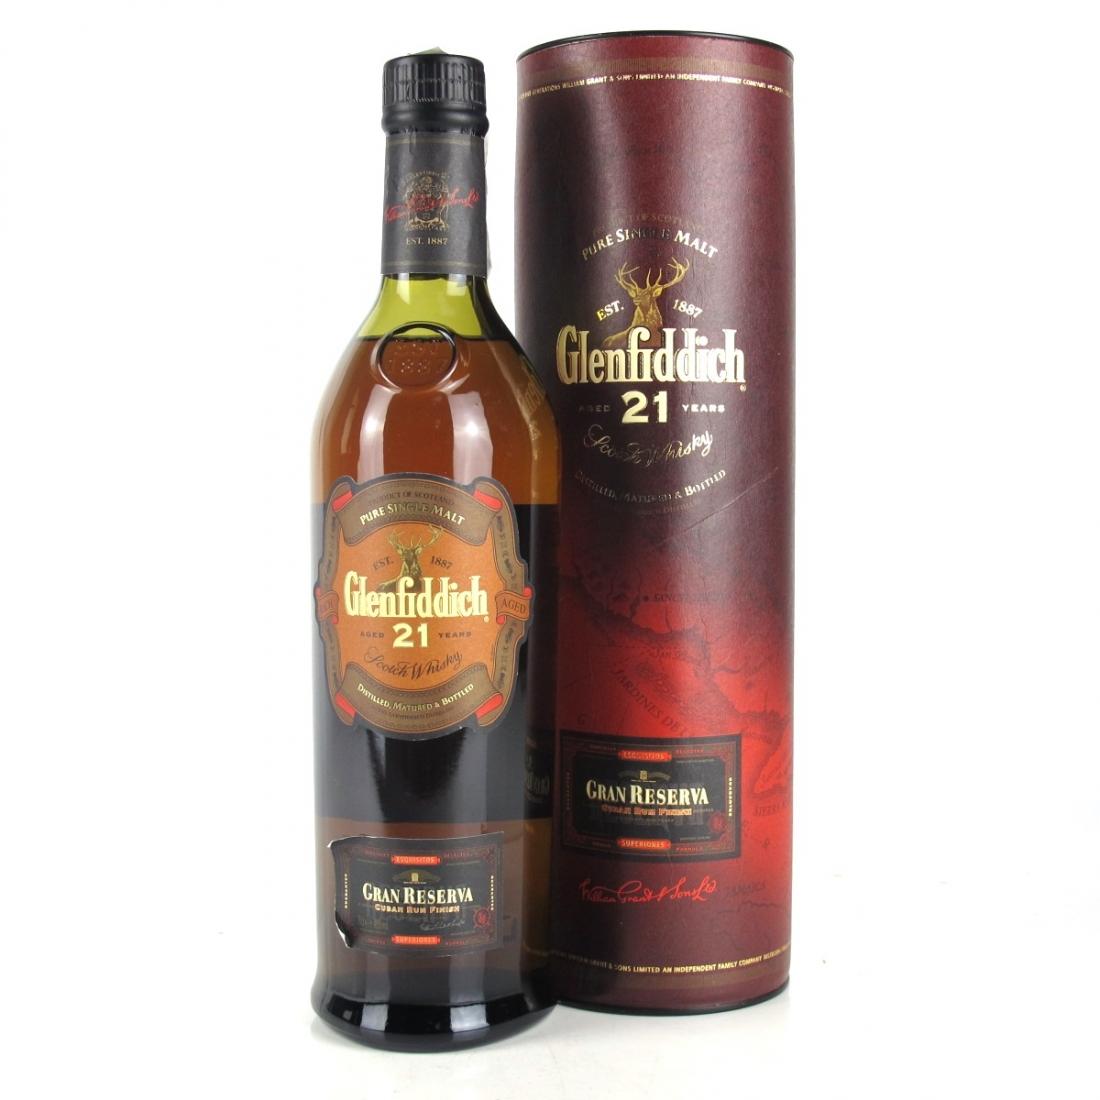 Glenfiddich 21 Year Old Gran Reserva / Cuban Rum Finish